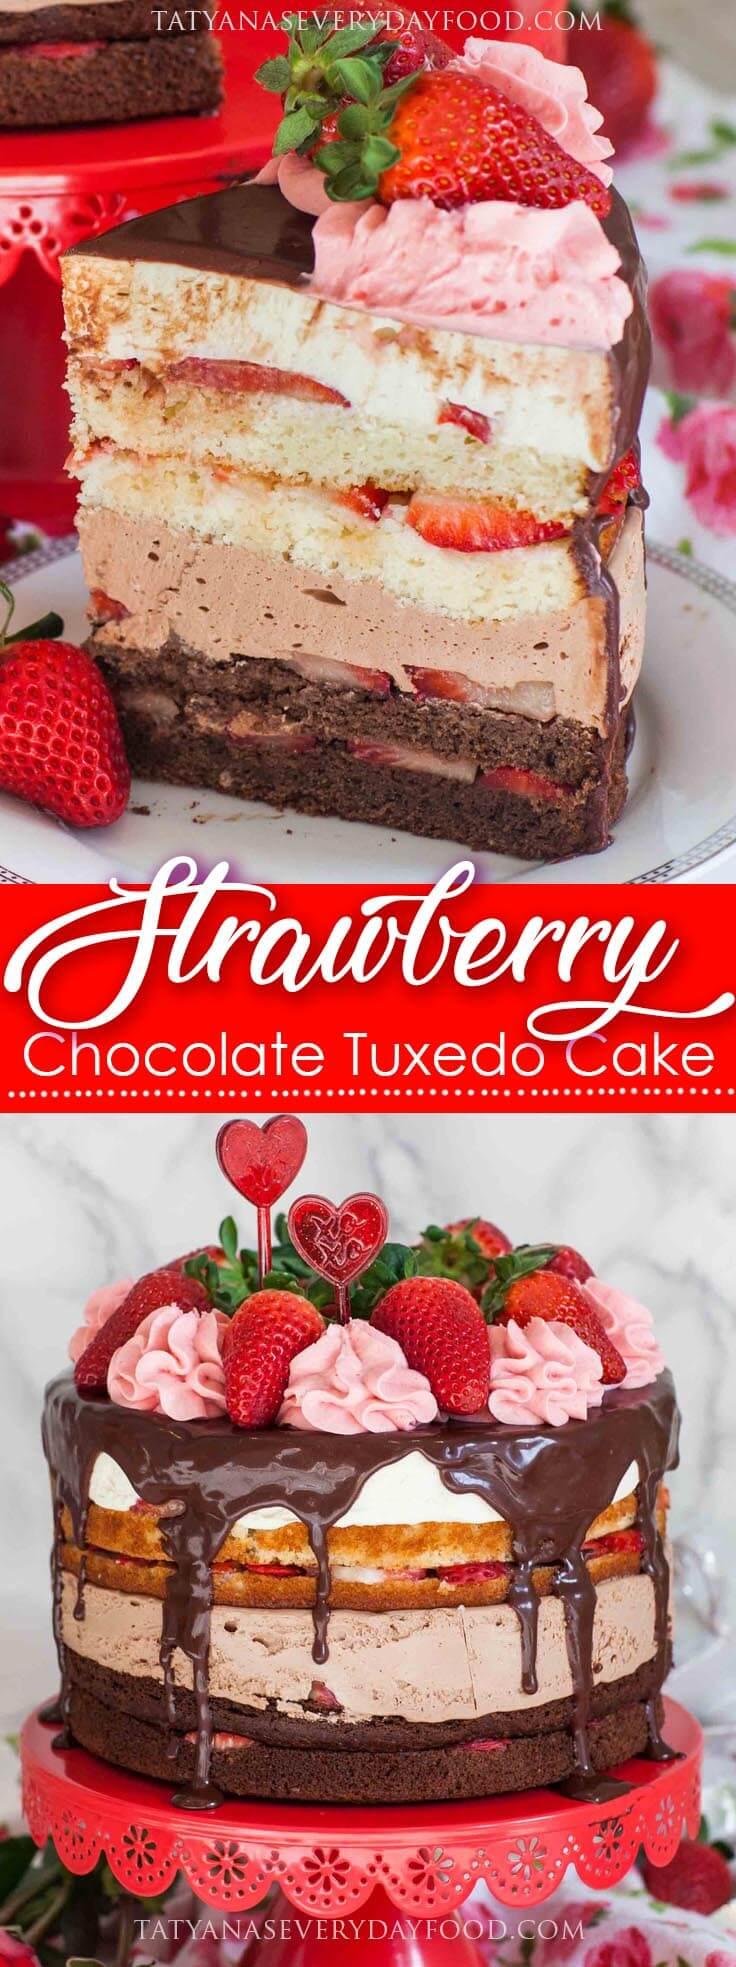 Strawberry Chocolate Tuxedo Cake Recipe with video